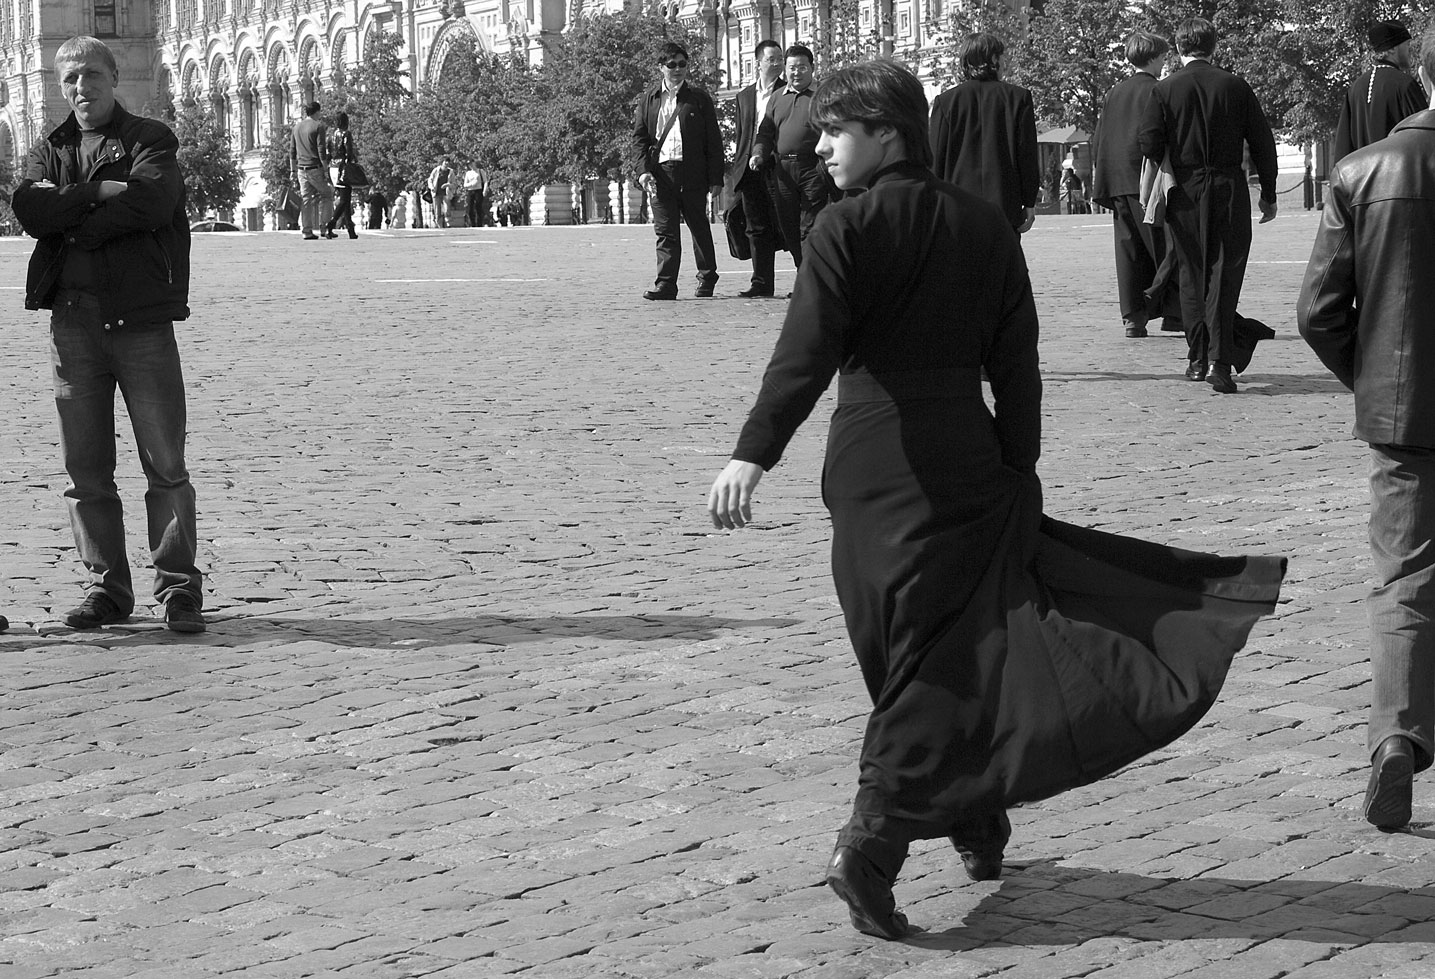 barcellona-lucio-de-santis-fotografia-photography-street-personal-photos-beauty-blackandwhite-priest